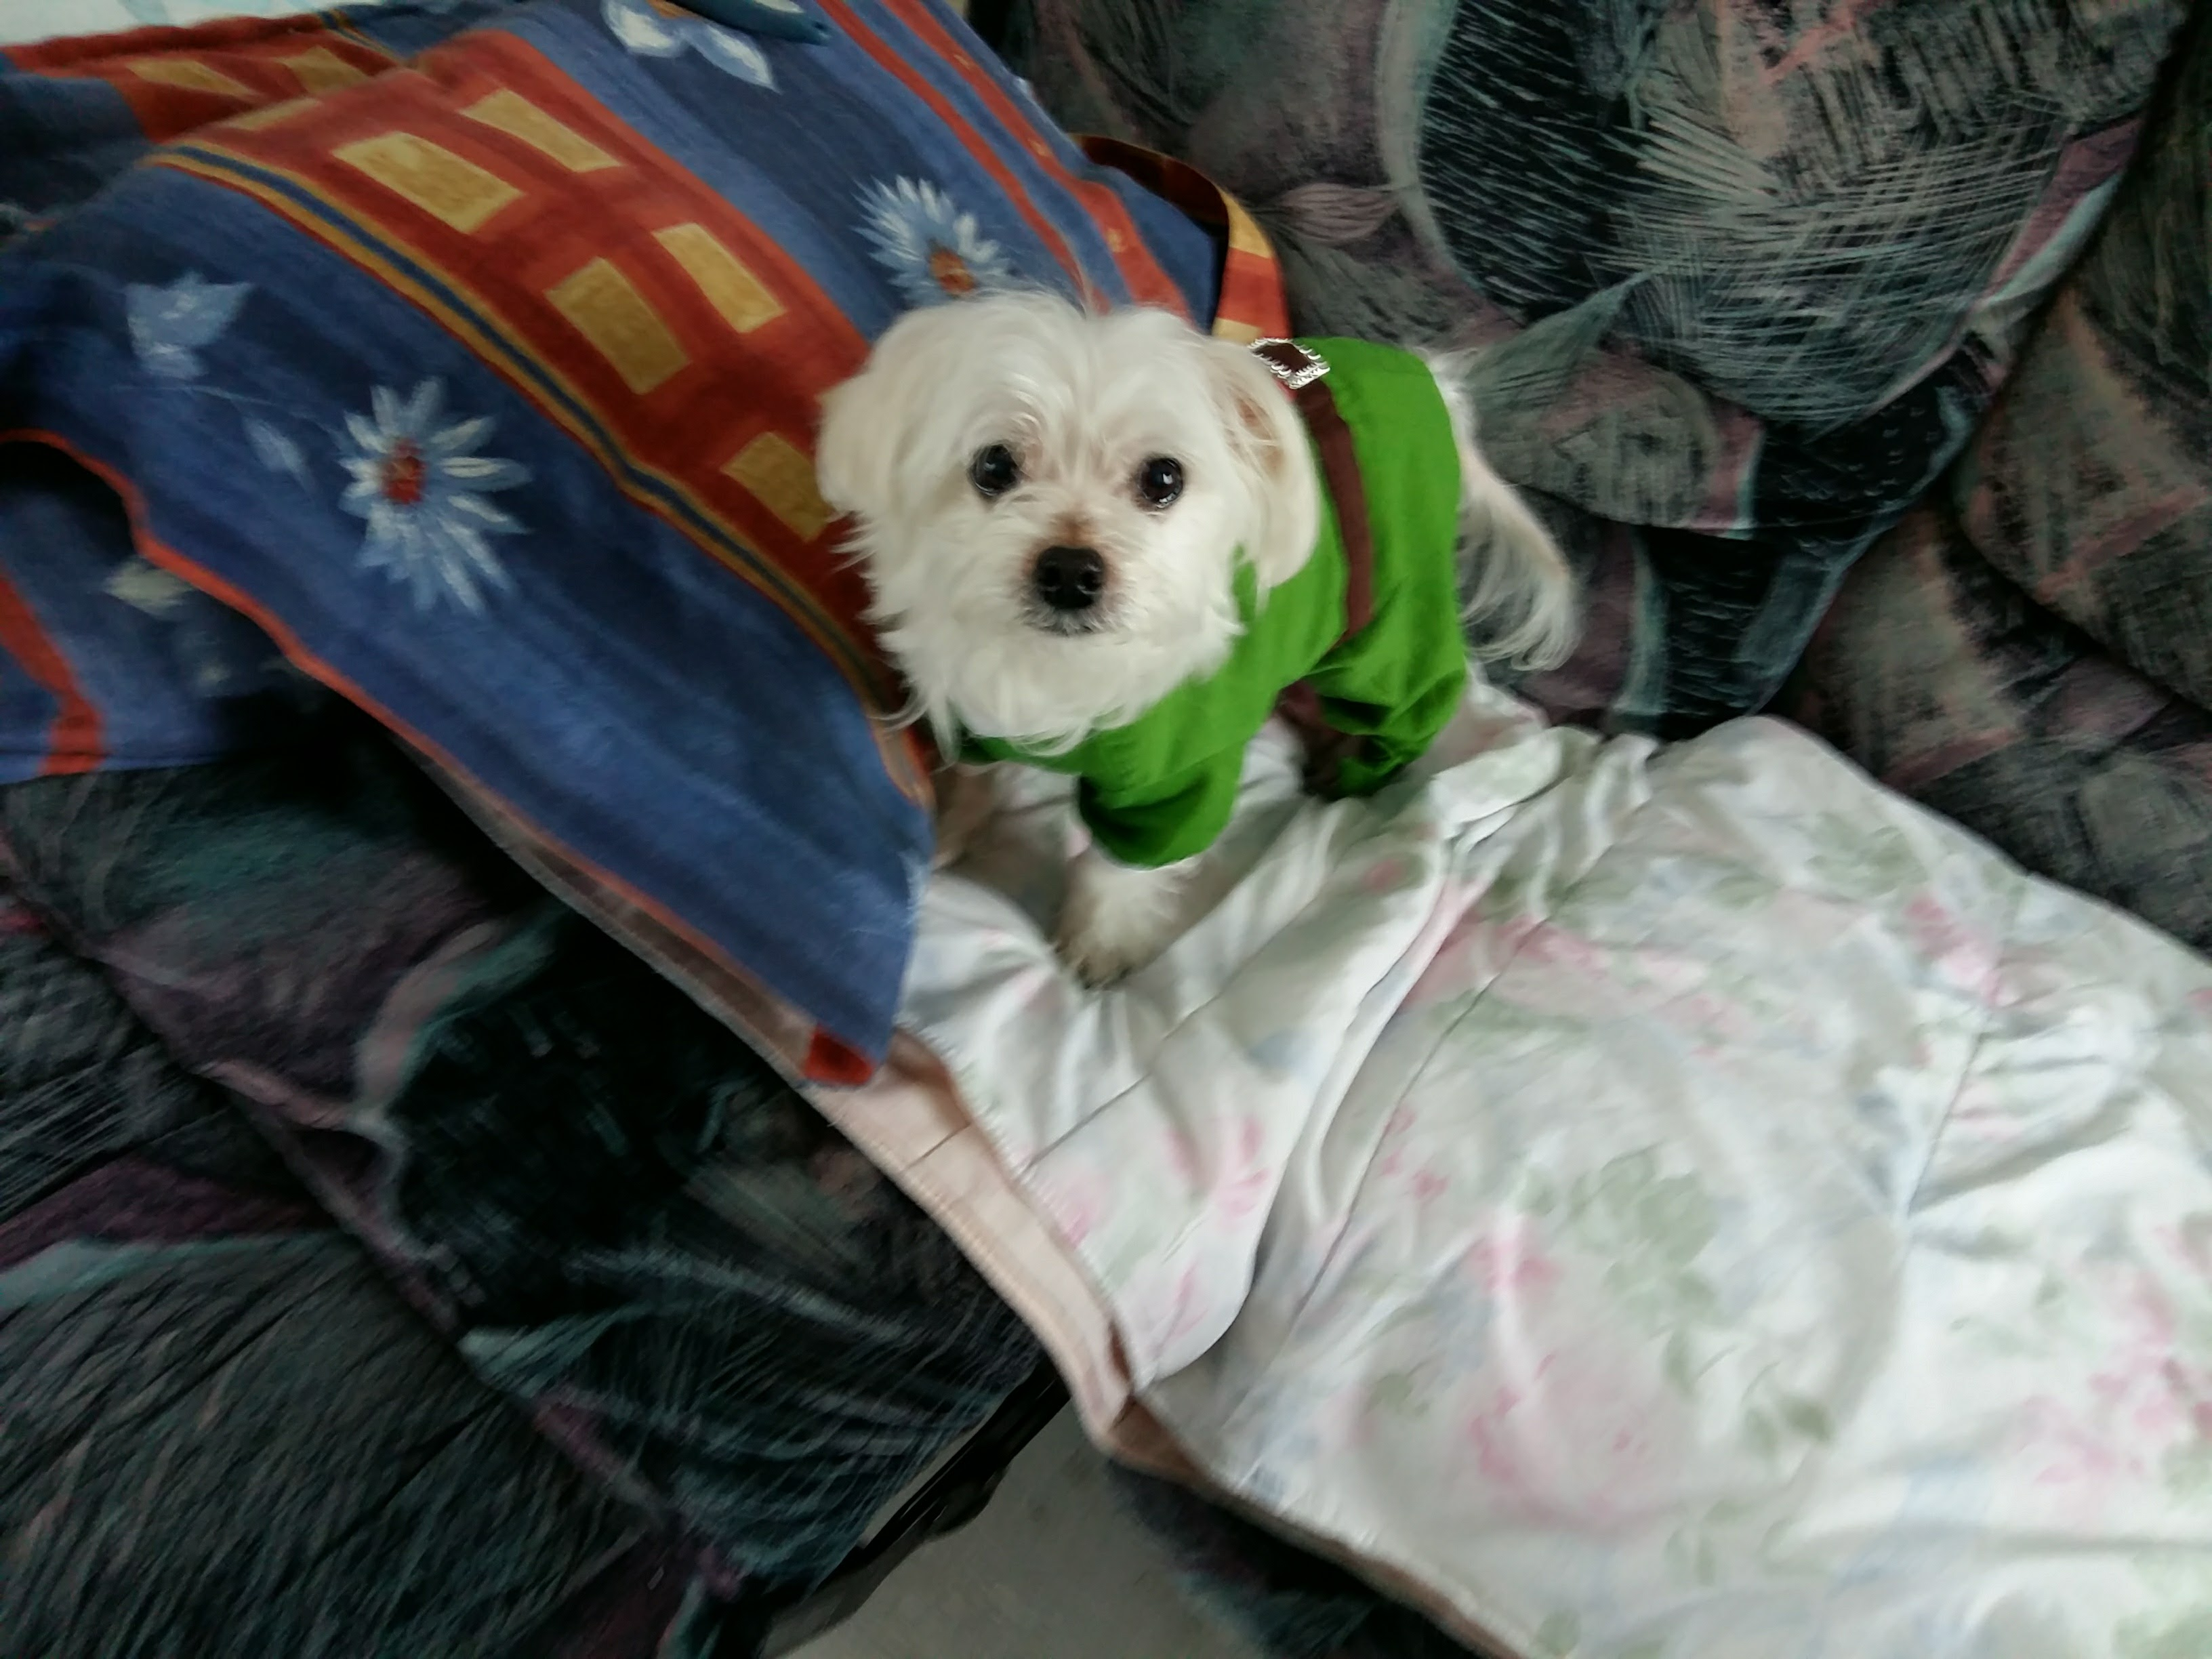 Puffyla Garderie les petits chiens mignons